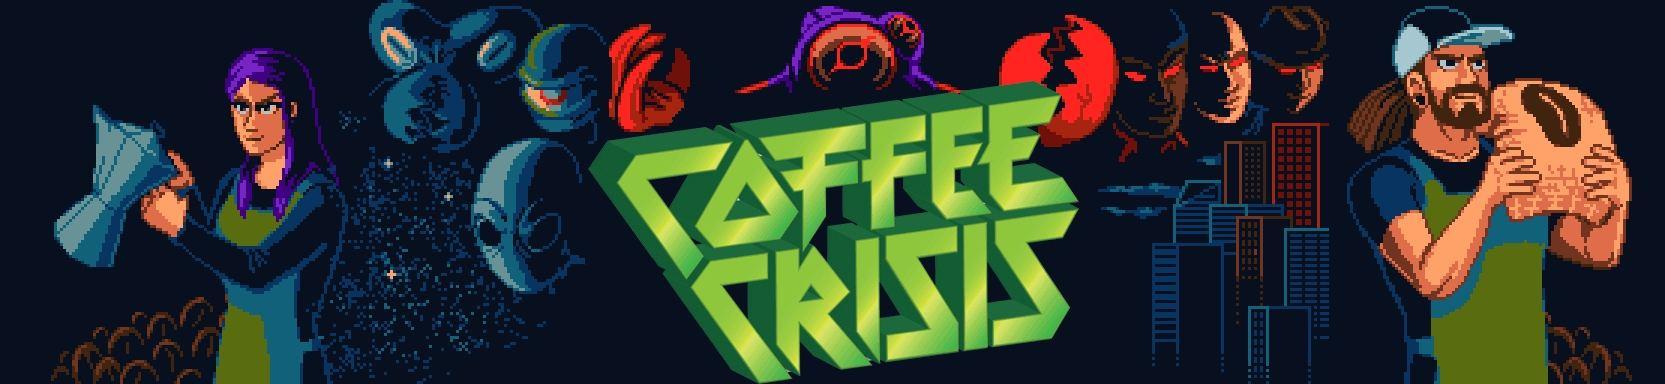 coffee crisis gif